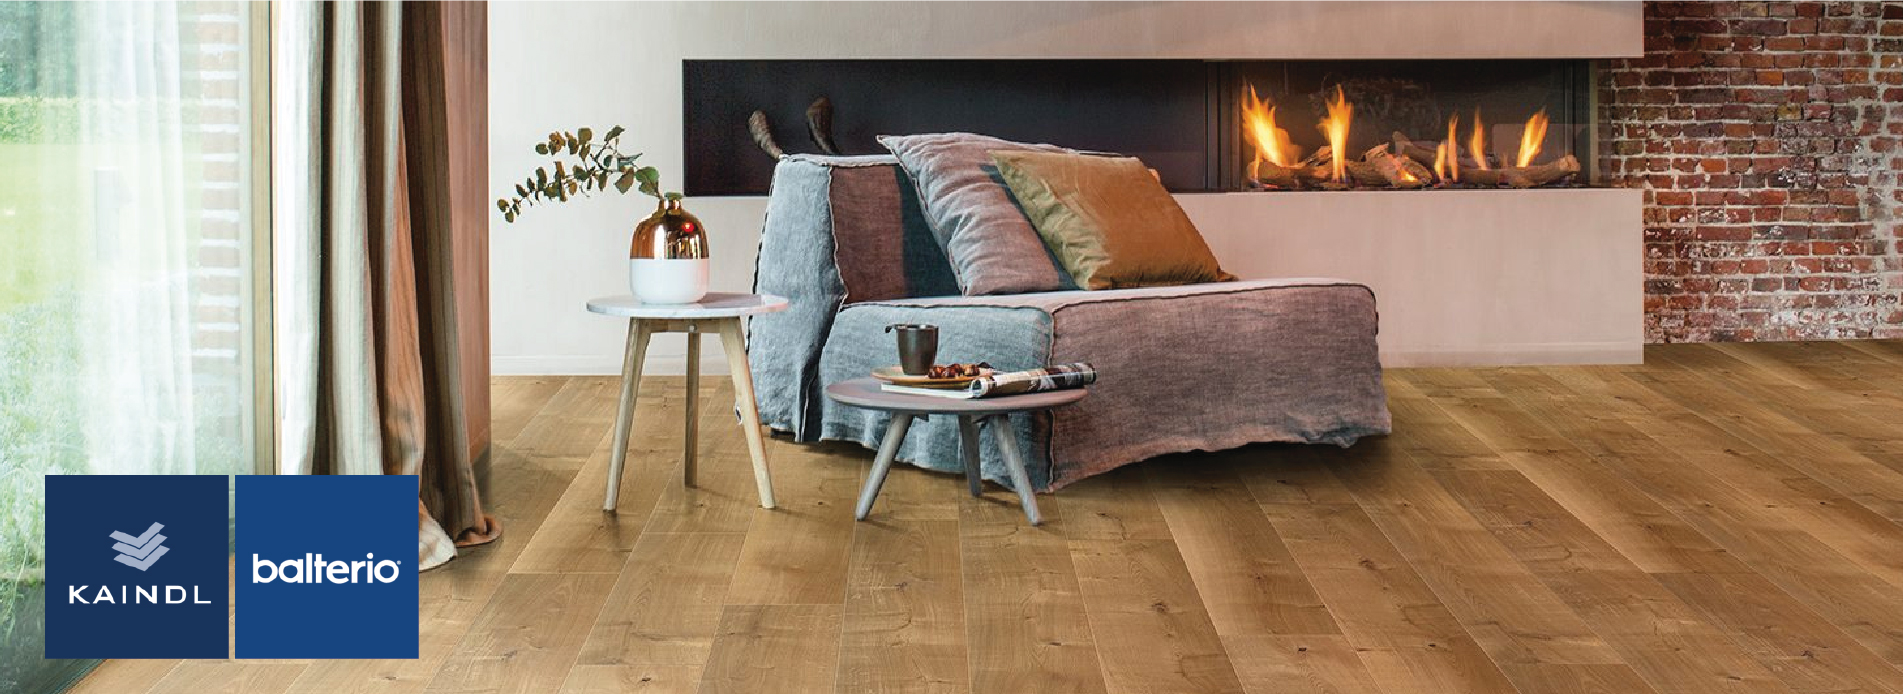 Balterio Kaindl Lifestyle Floors banner